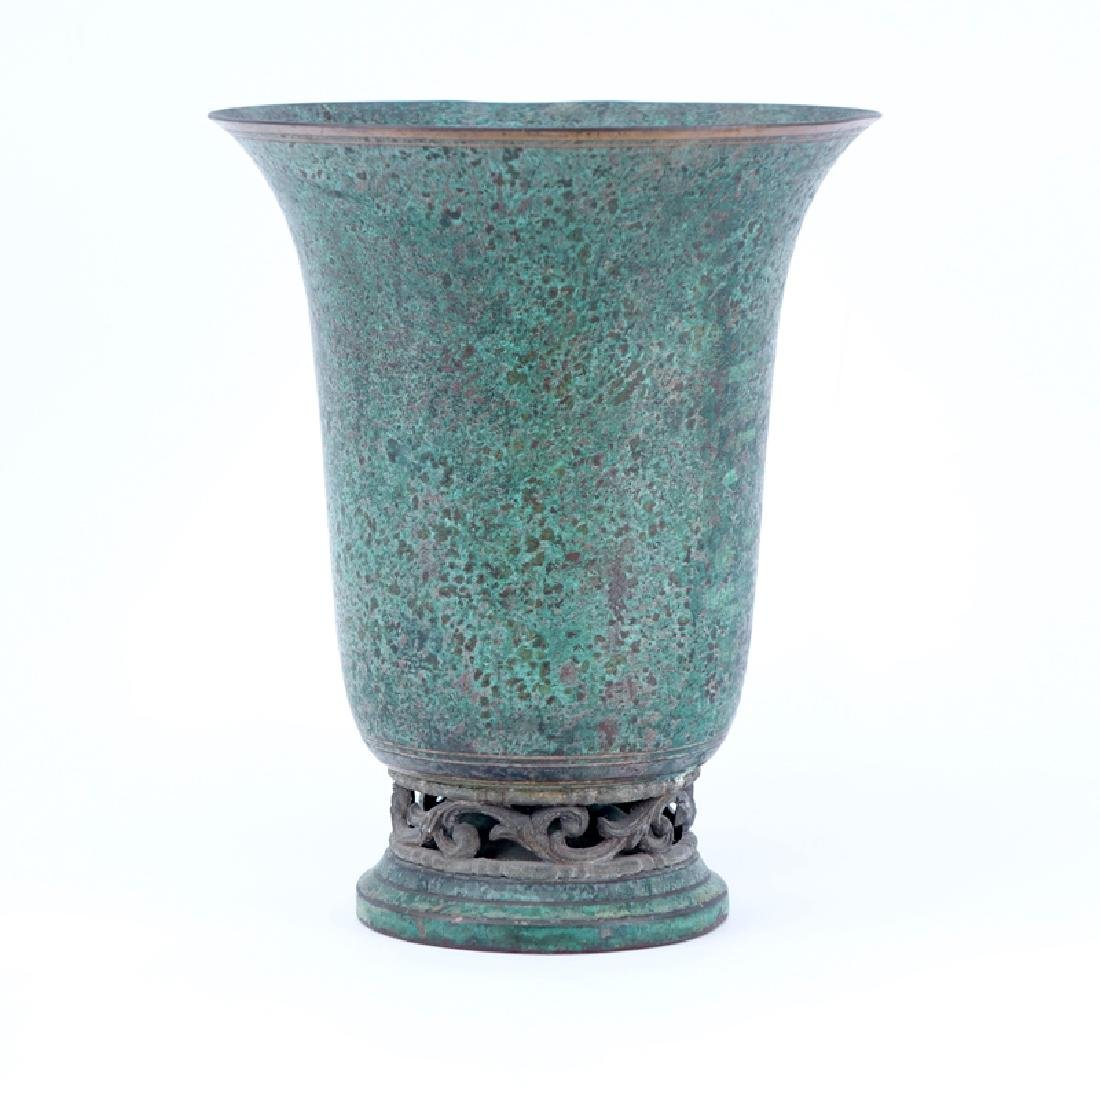 Carl Sorenson Verdigris Patinated Bronze Vase. Signed.